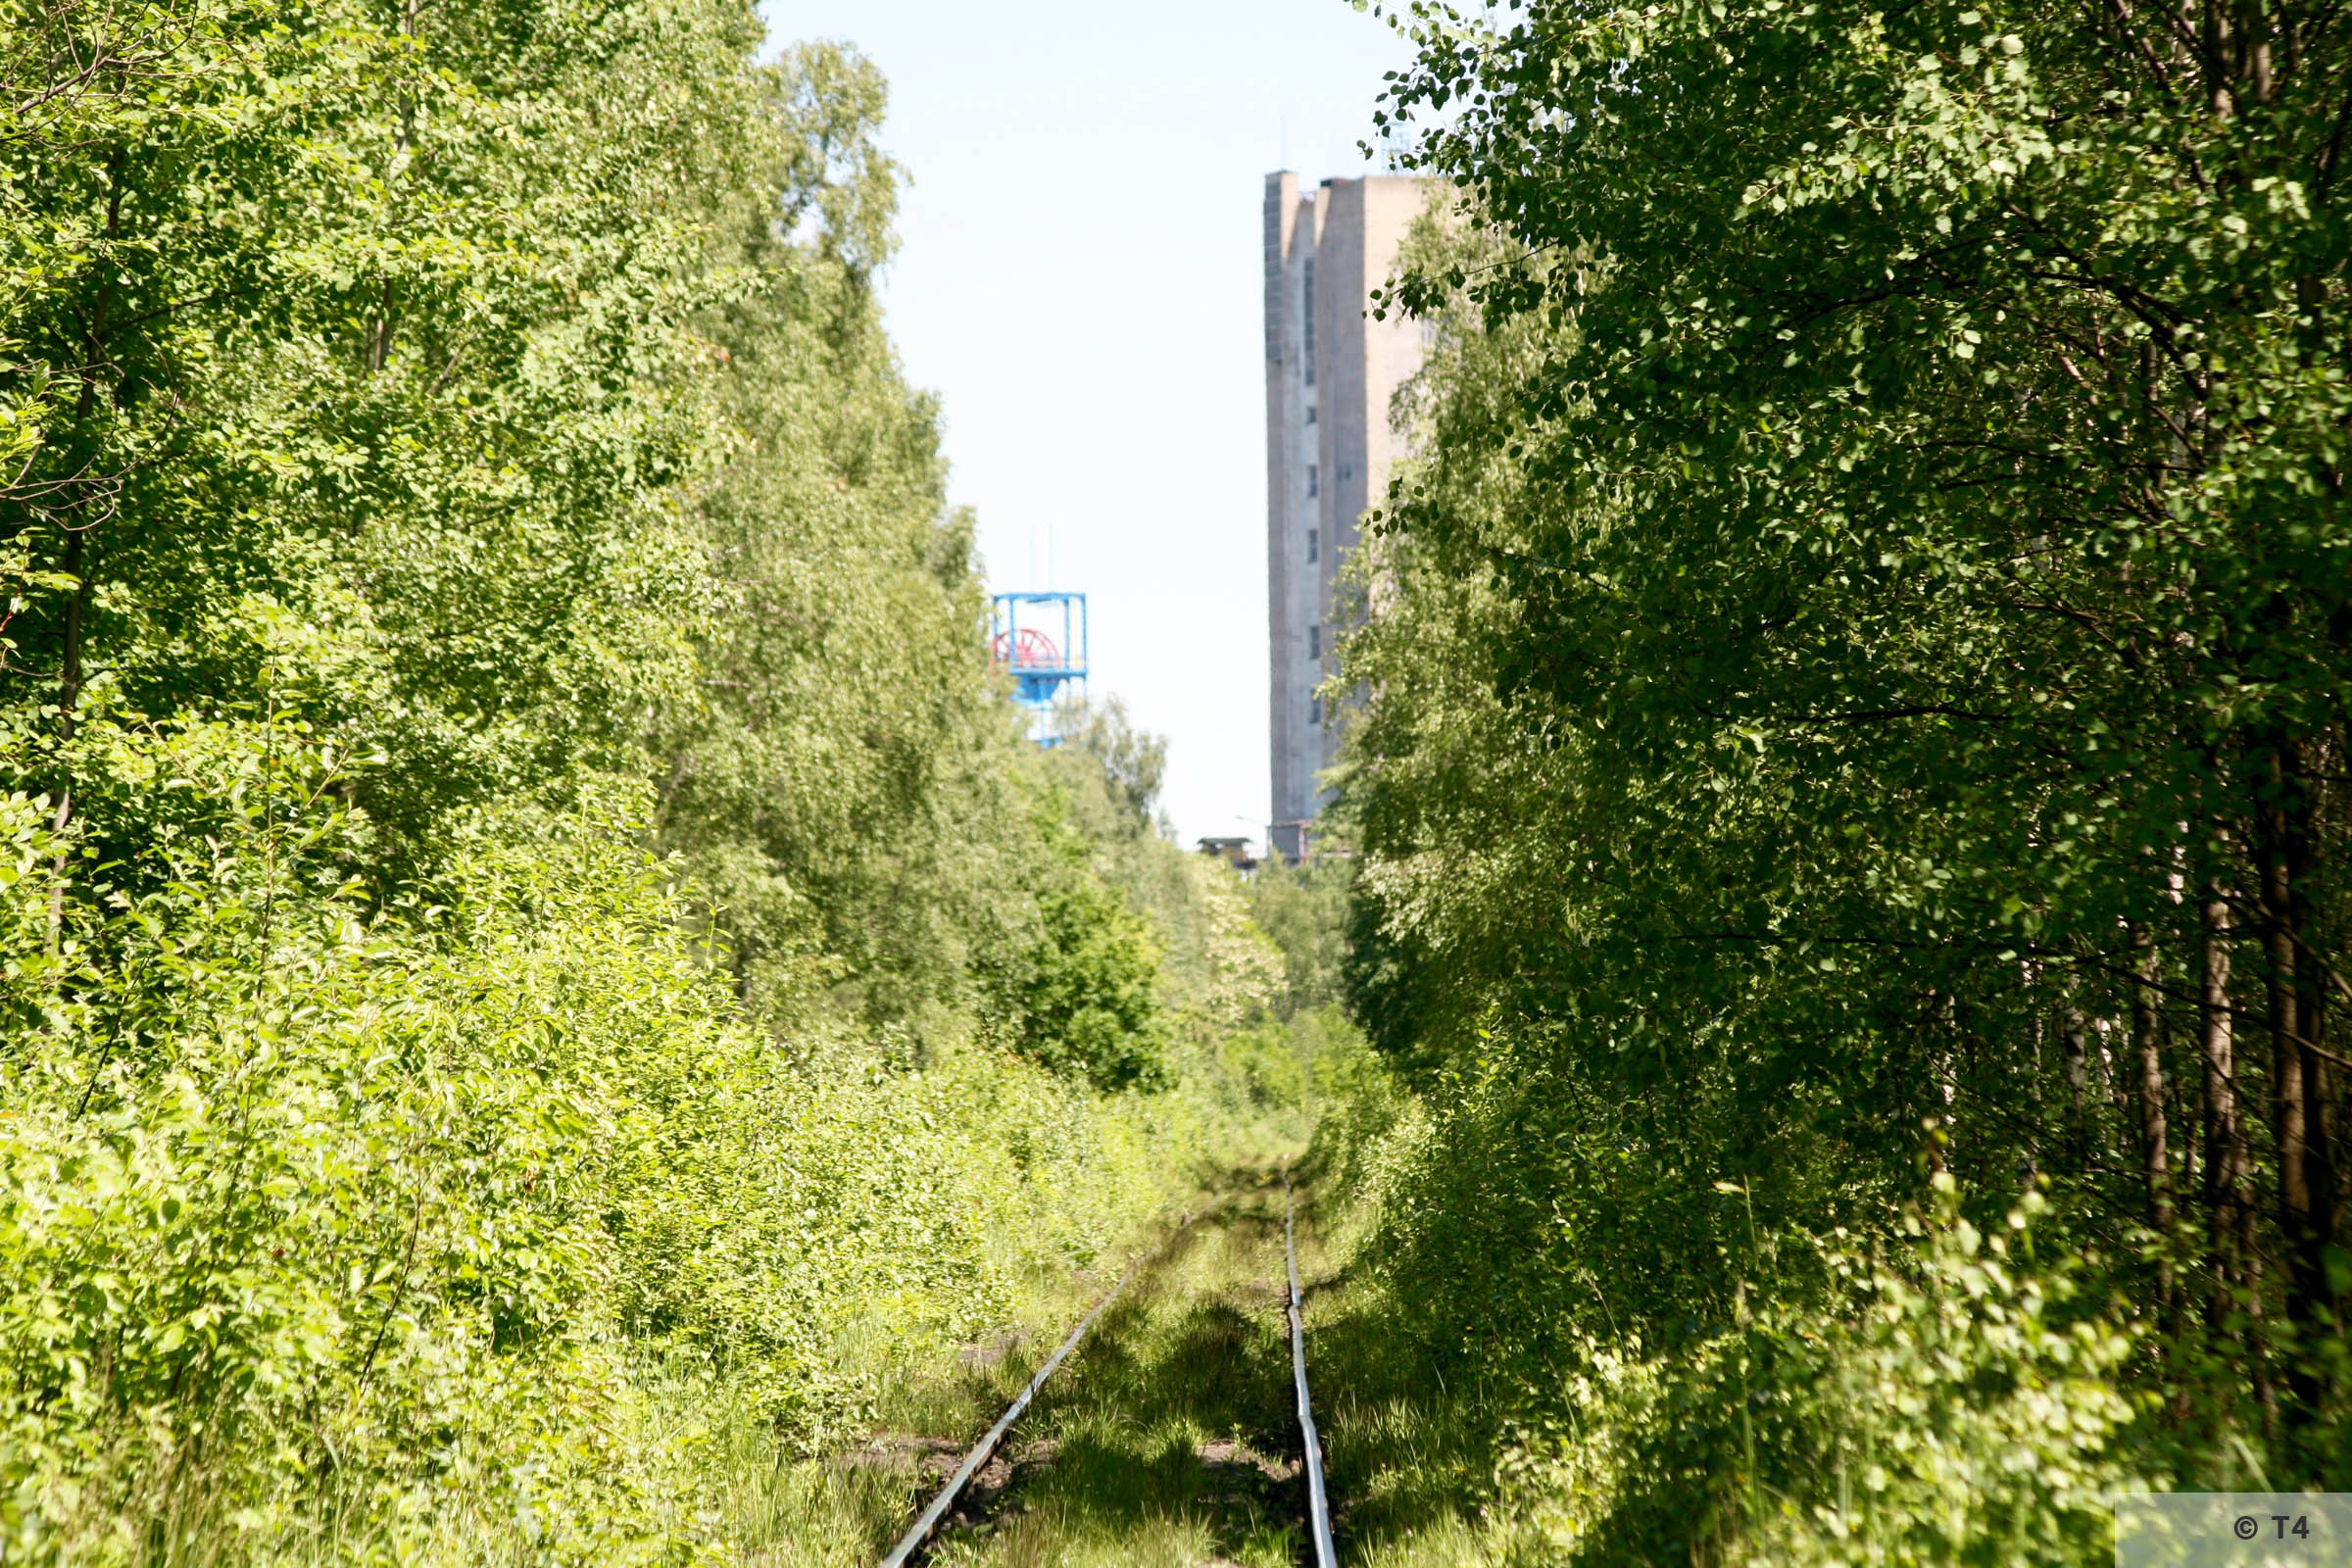 Rail track to former Dachsgrube mine. 2008 T4 7828